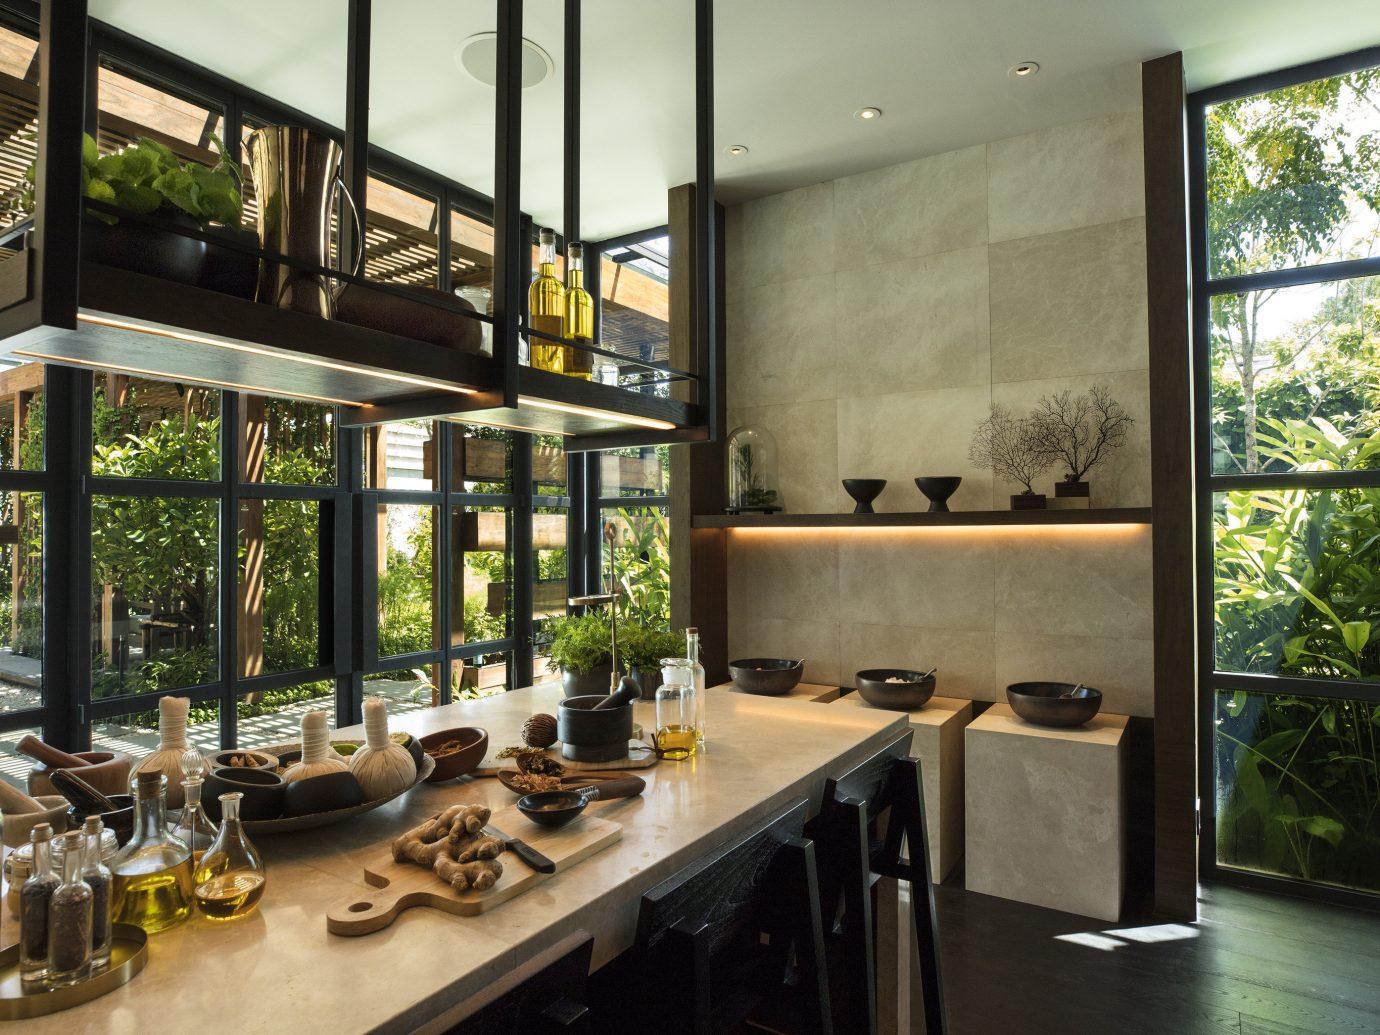 Trip Ideas Winter indoor window interior design house countertop glass